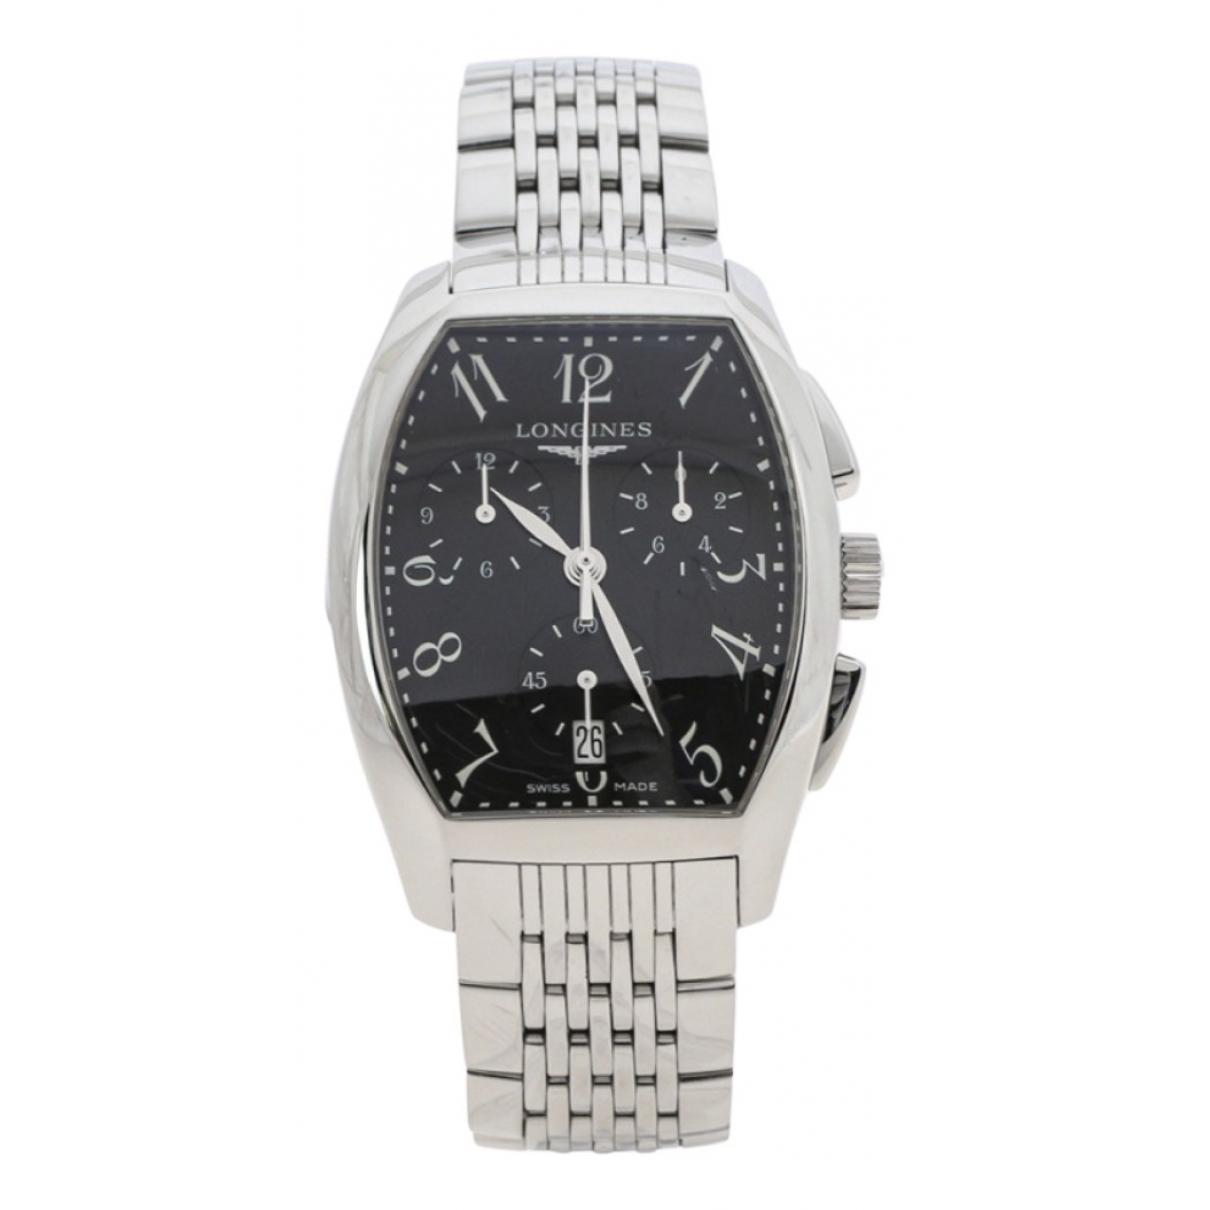 Longines Evidenza Black Steel watch for Men N